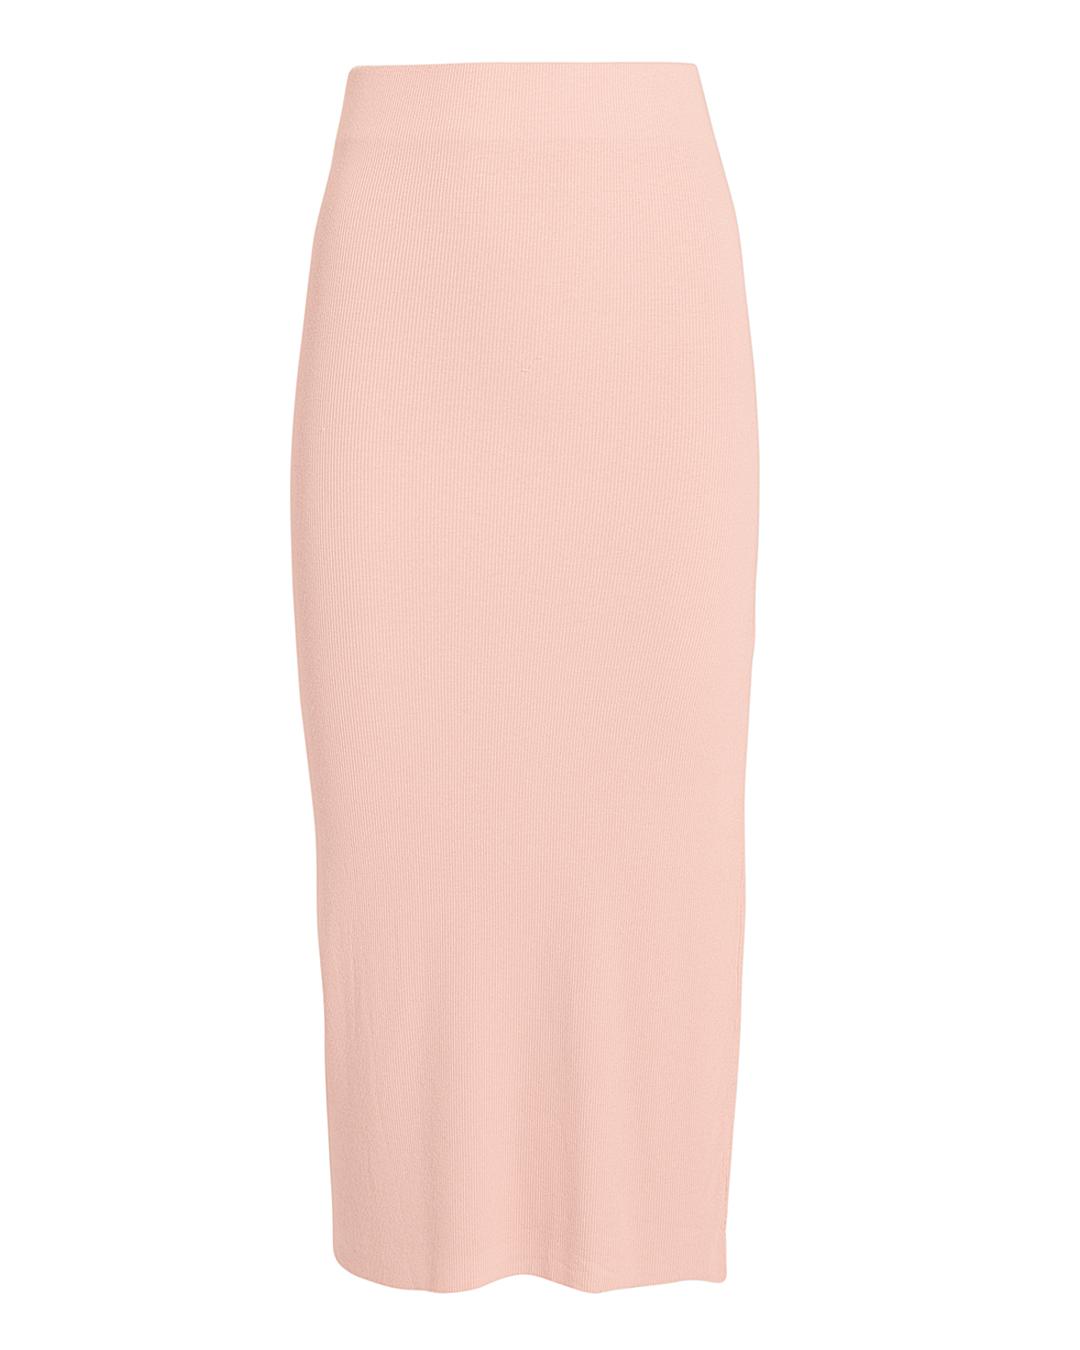 Elbourne Blush Idi Skirt Pink